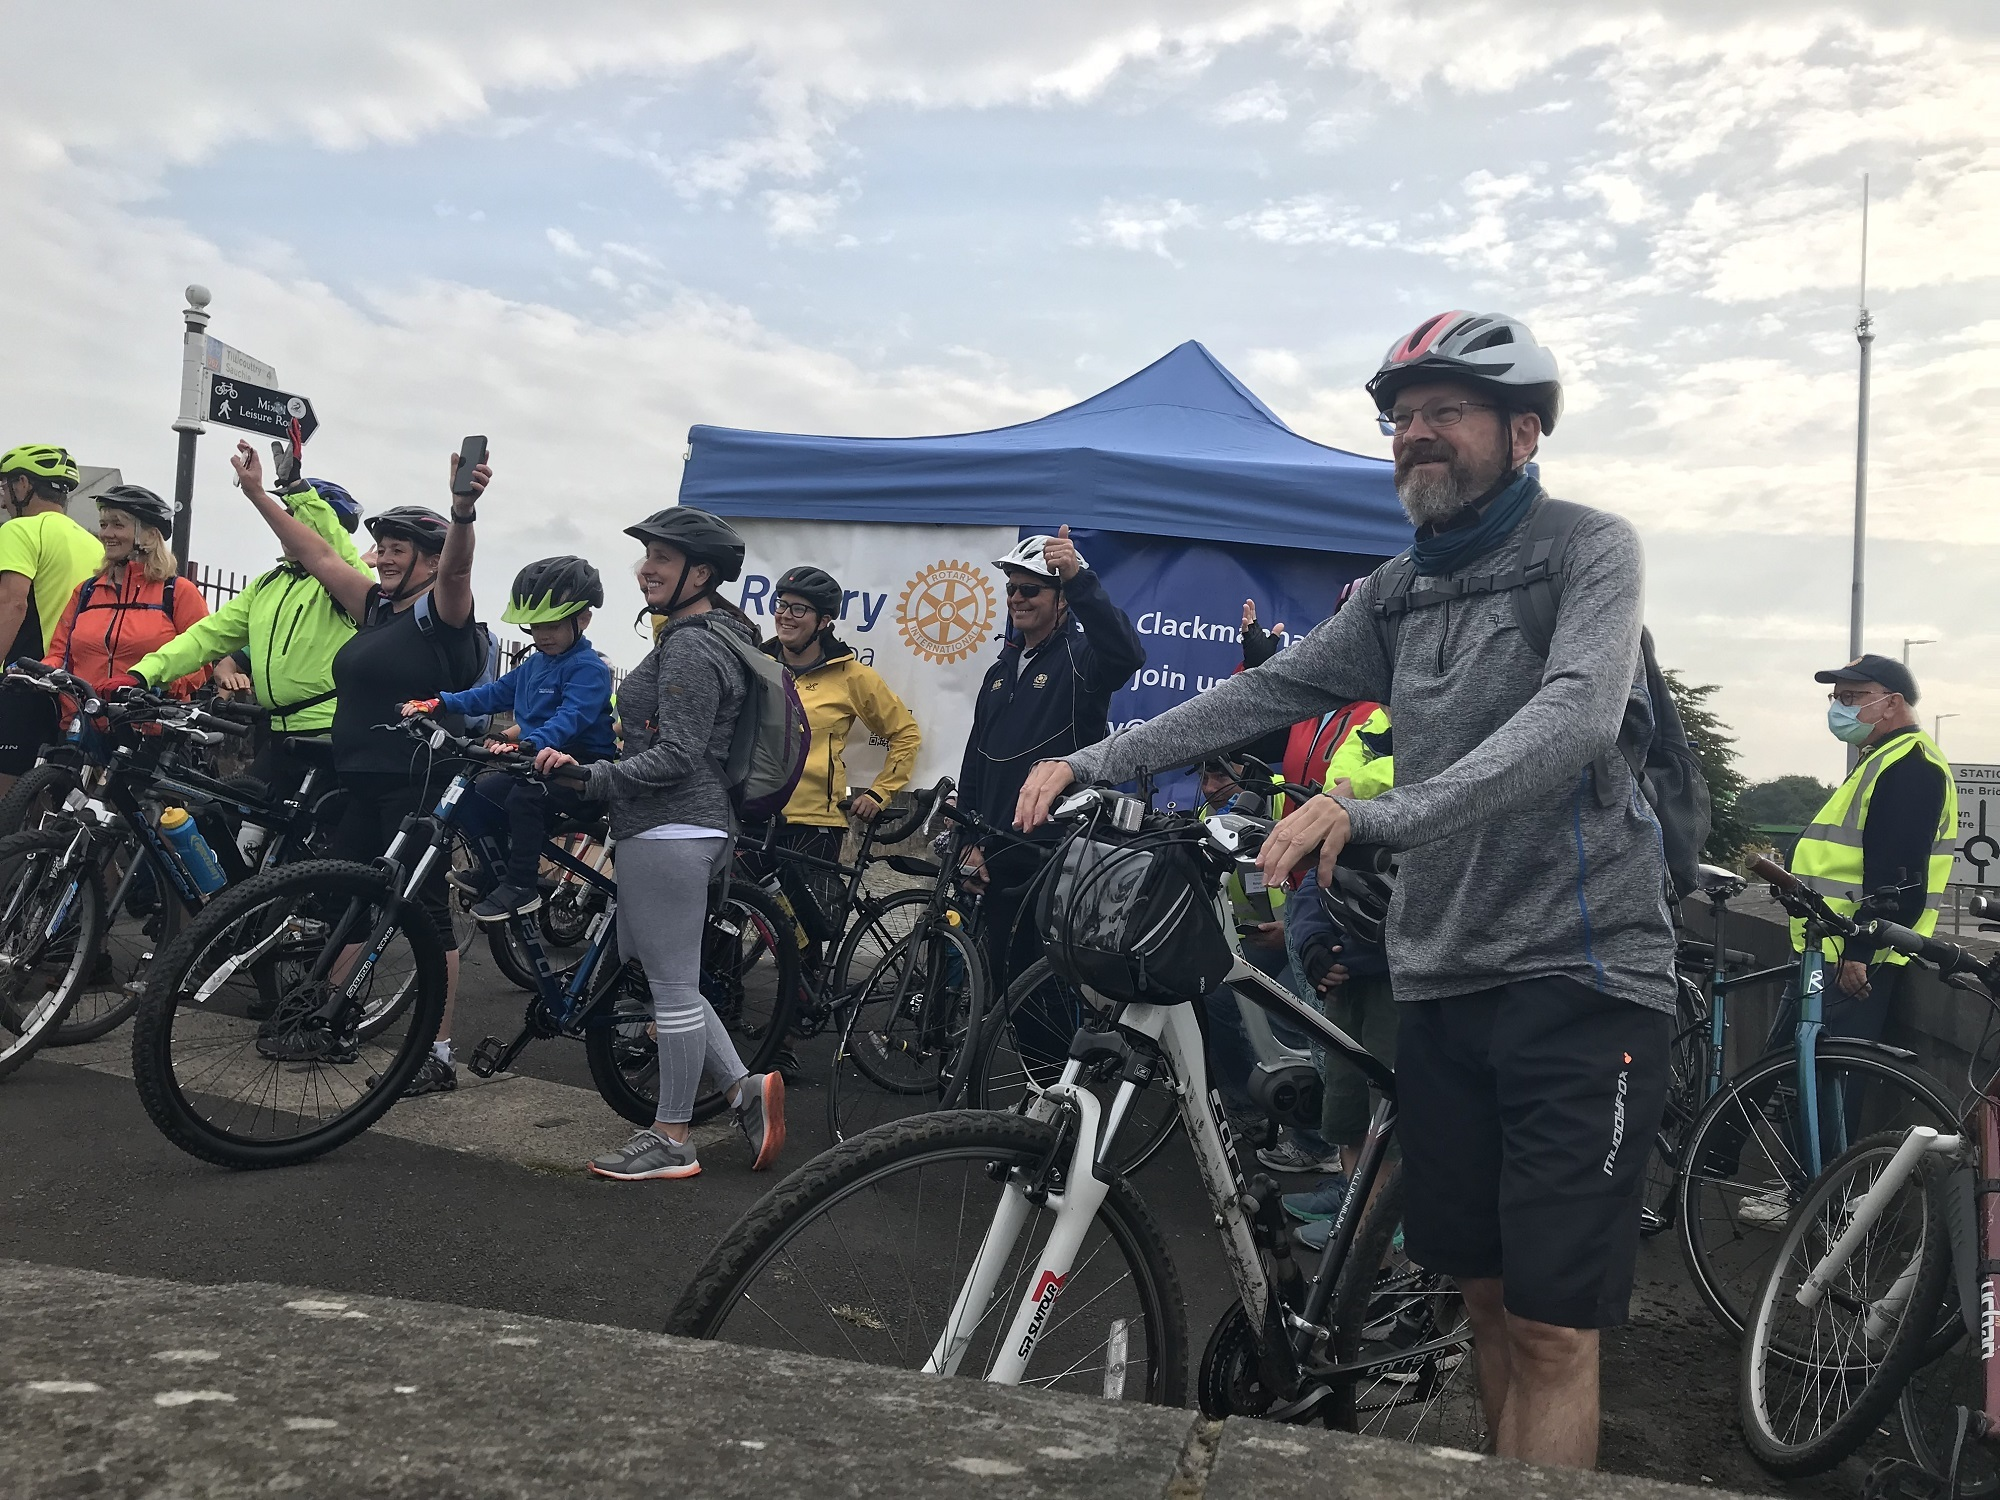 Dozens of Wee County cyclists participate in Tour de Clacks fundraiser